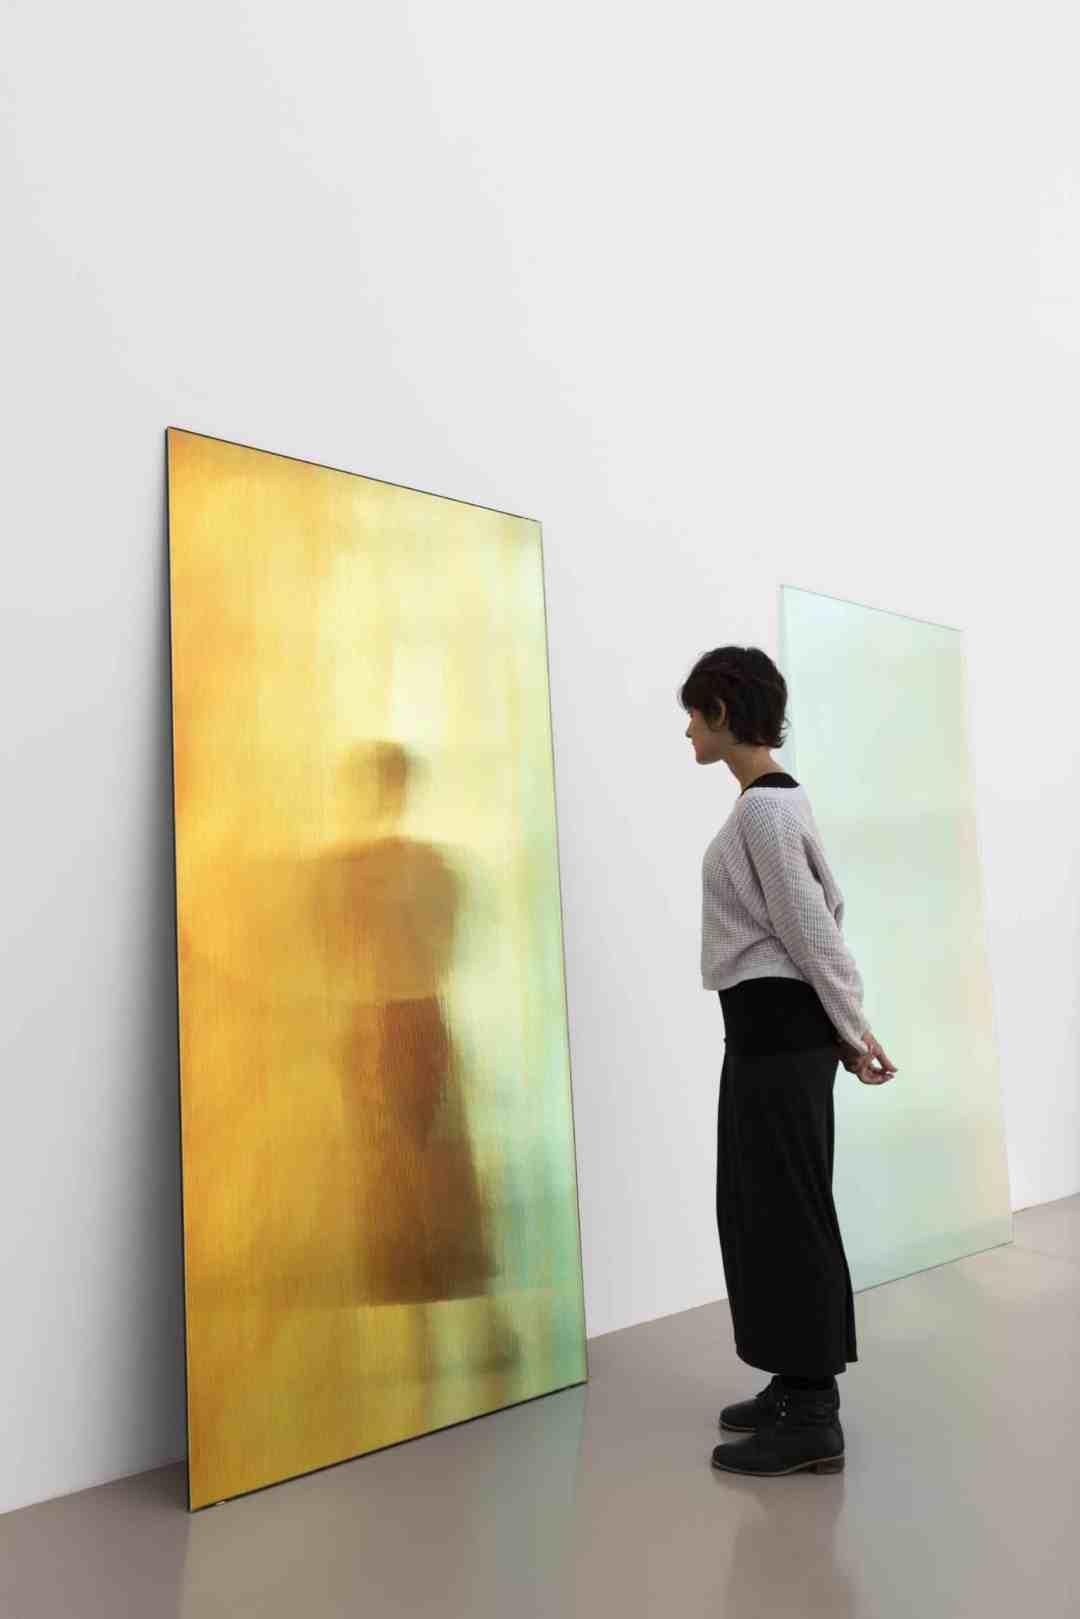 Ann Veronica Janssens, HOT PINK TURQUOISE, Louisiana Museum of Modern Art